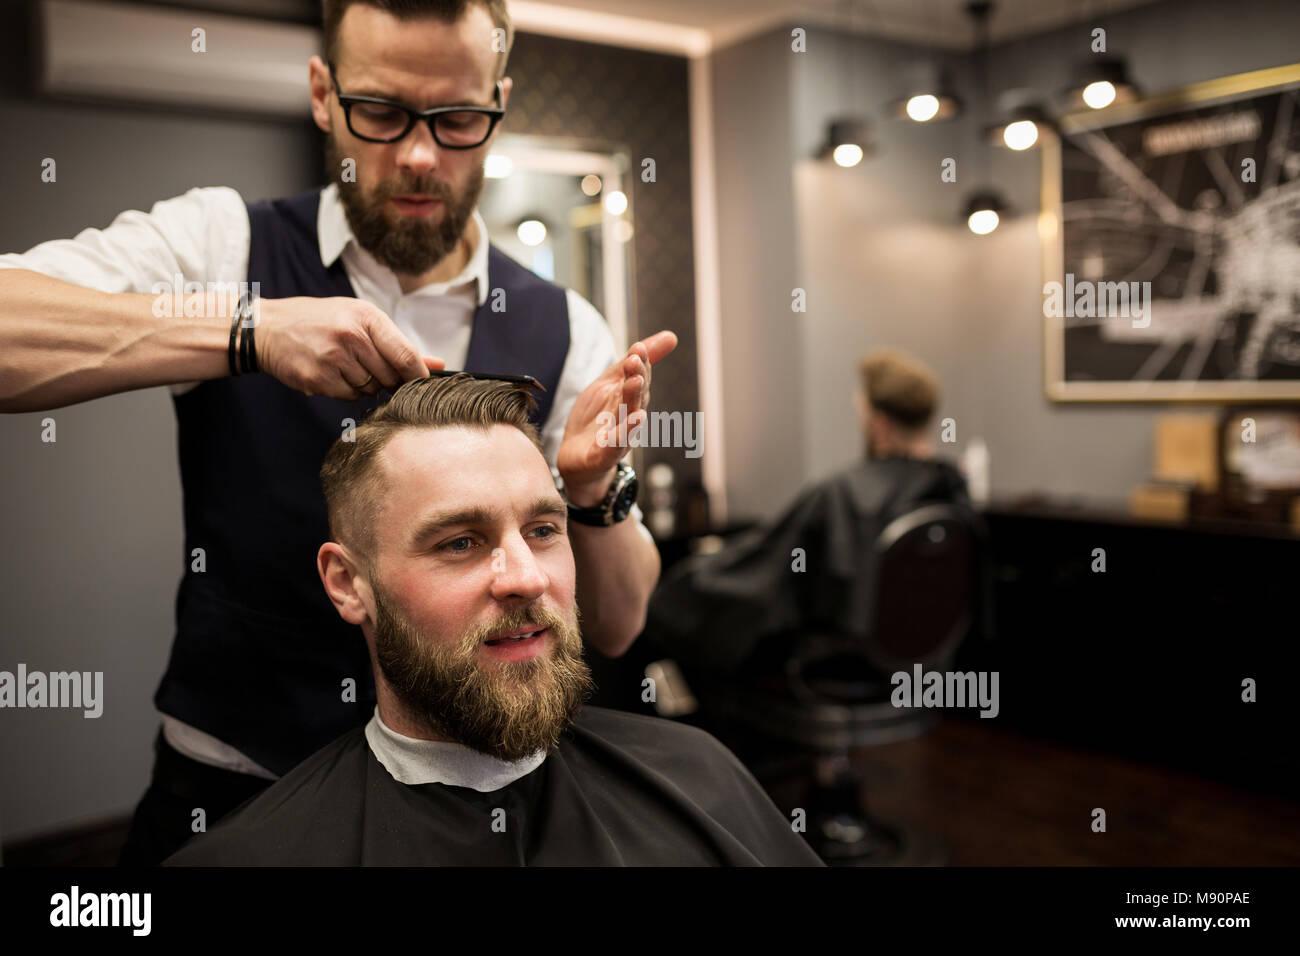 Portrait of of glad customer having hair cut at salon - Stock Image